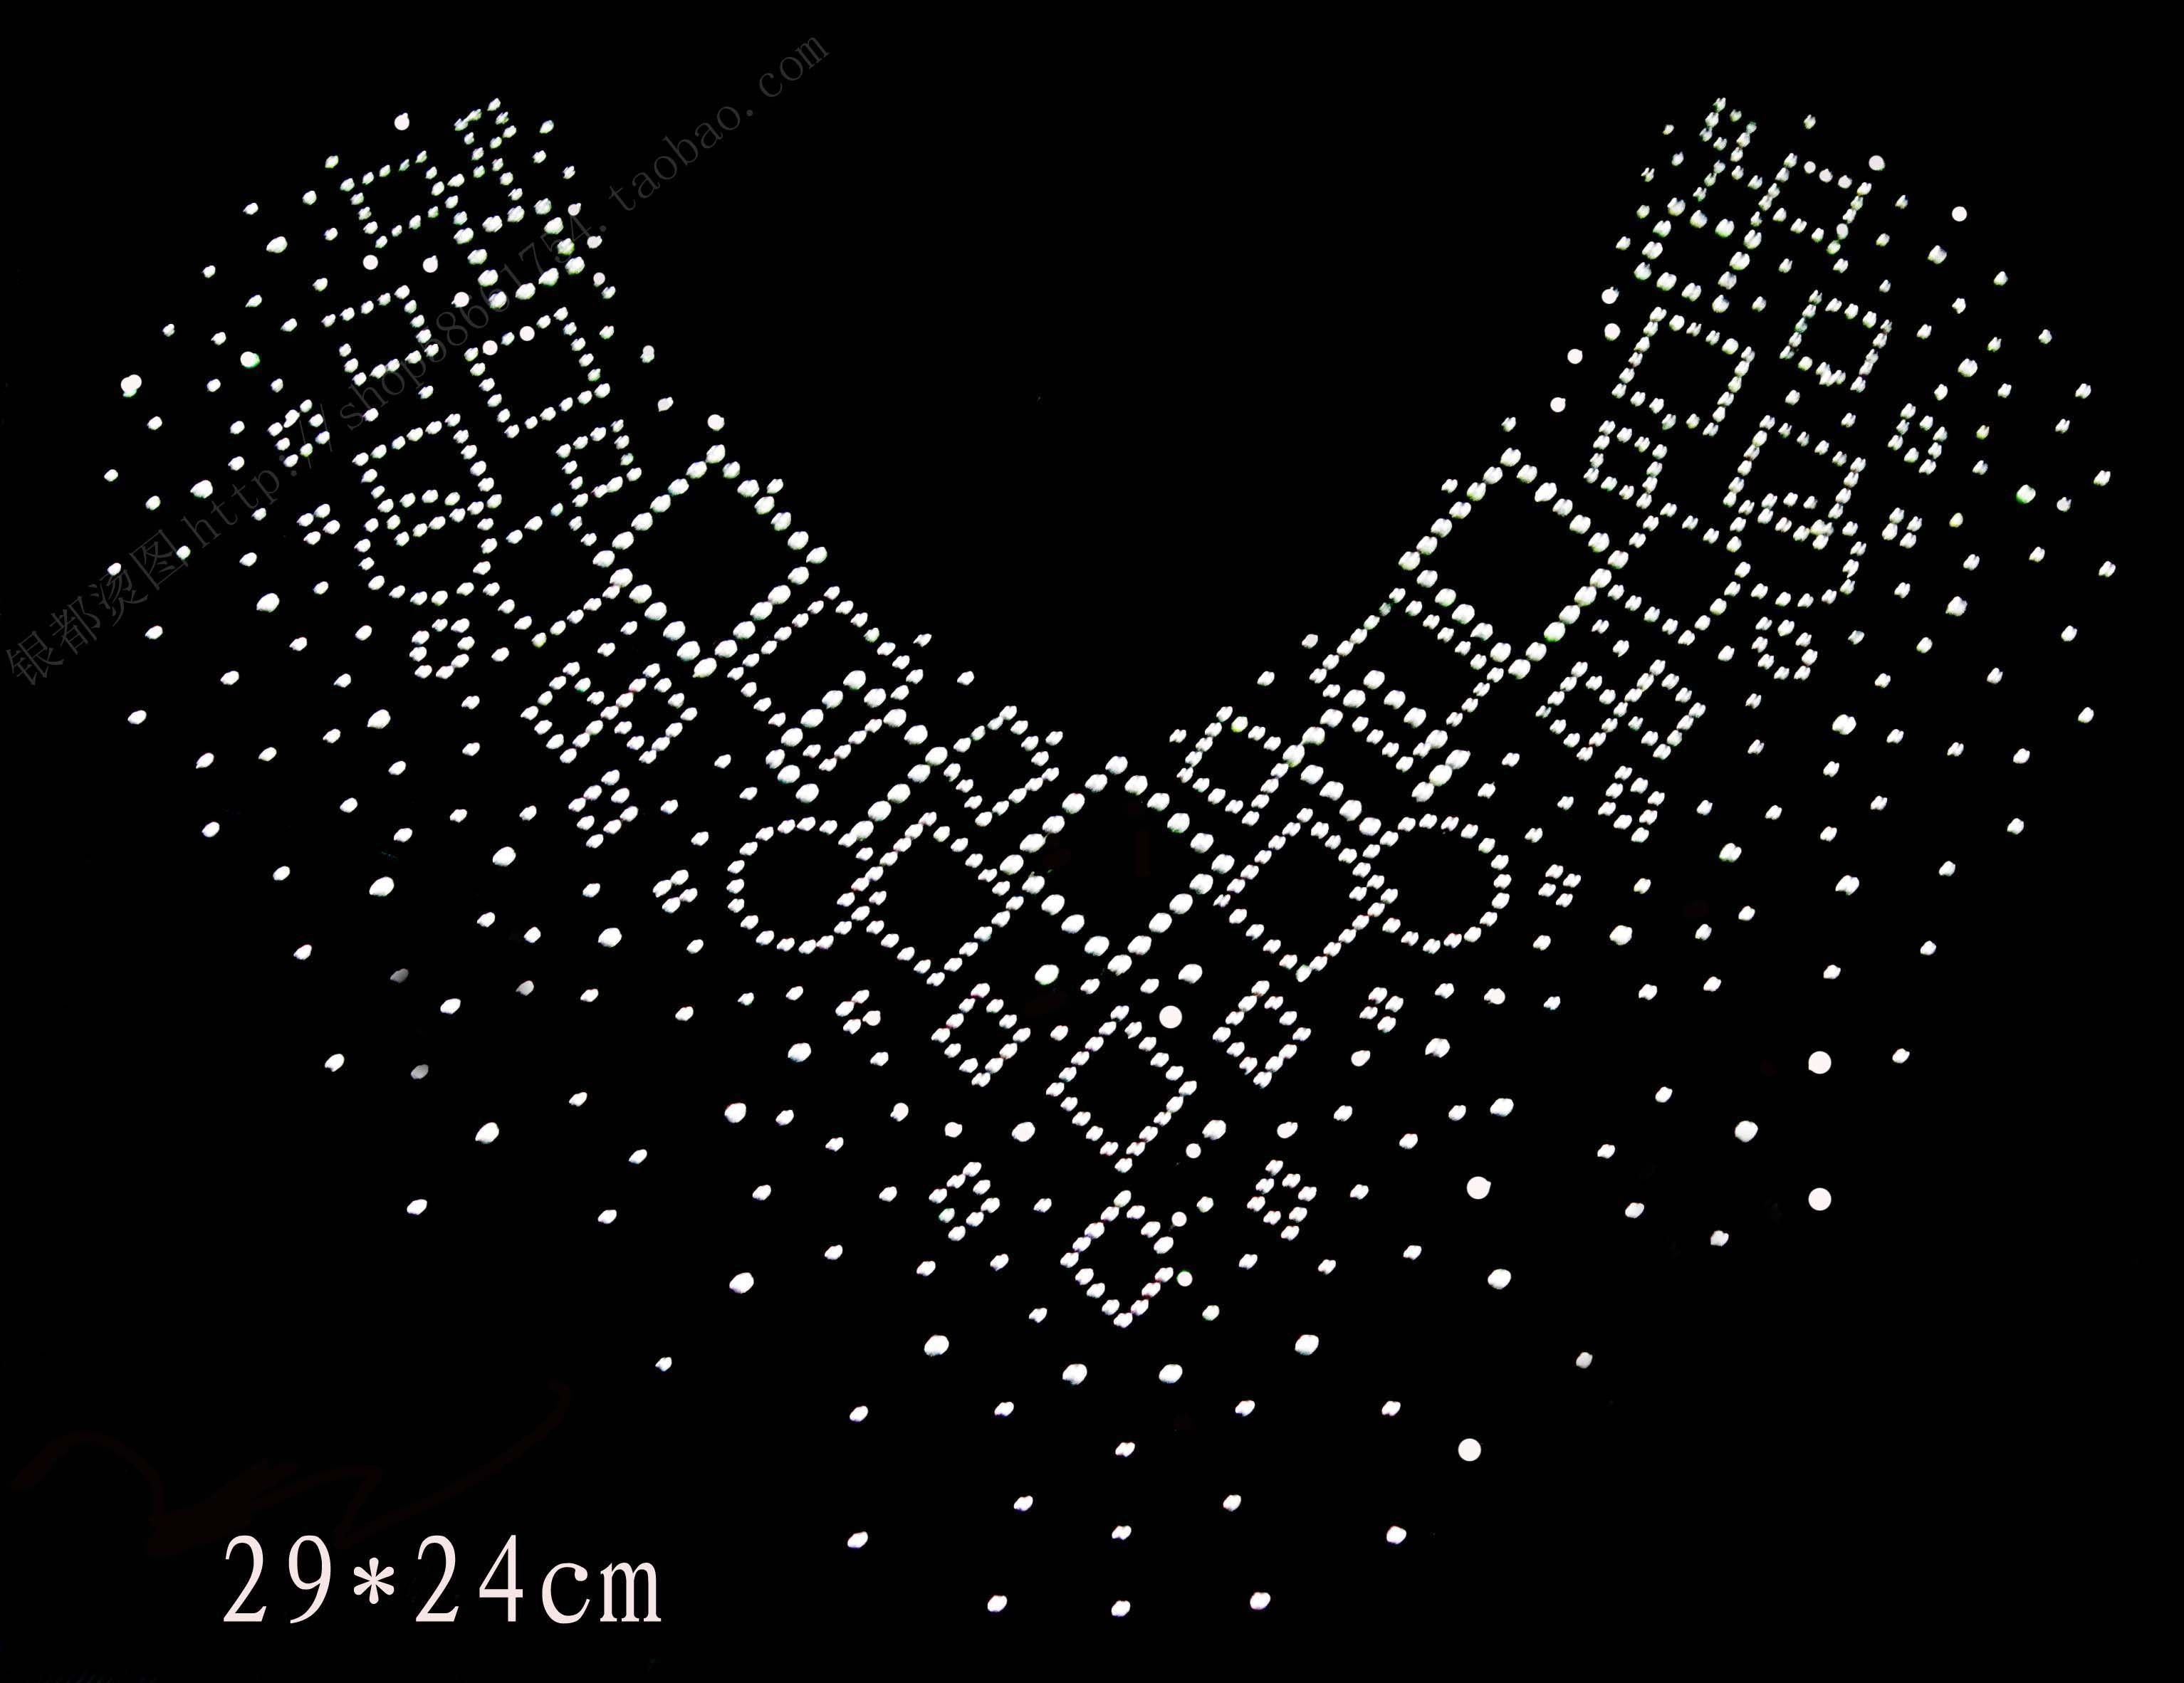 2Pcs Lot Hot Fix Rhinestone Iron On Heat Transfer clothing bling designs  for shirts 09efa6396596